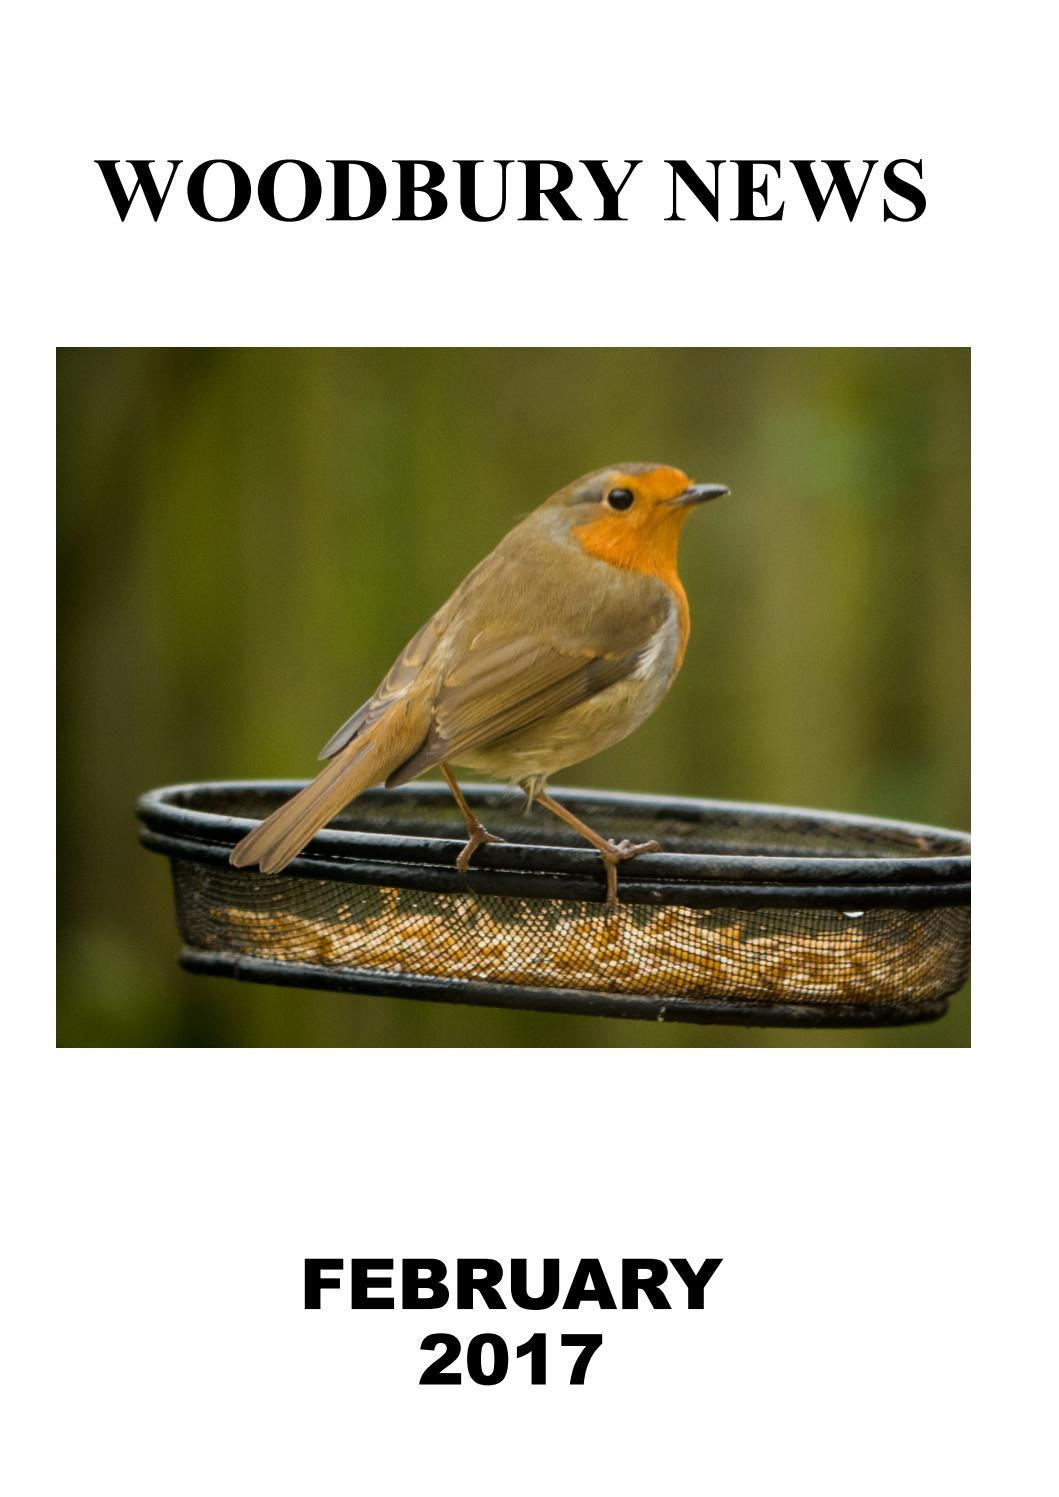 February 2017 by Woodbury News issuu